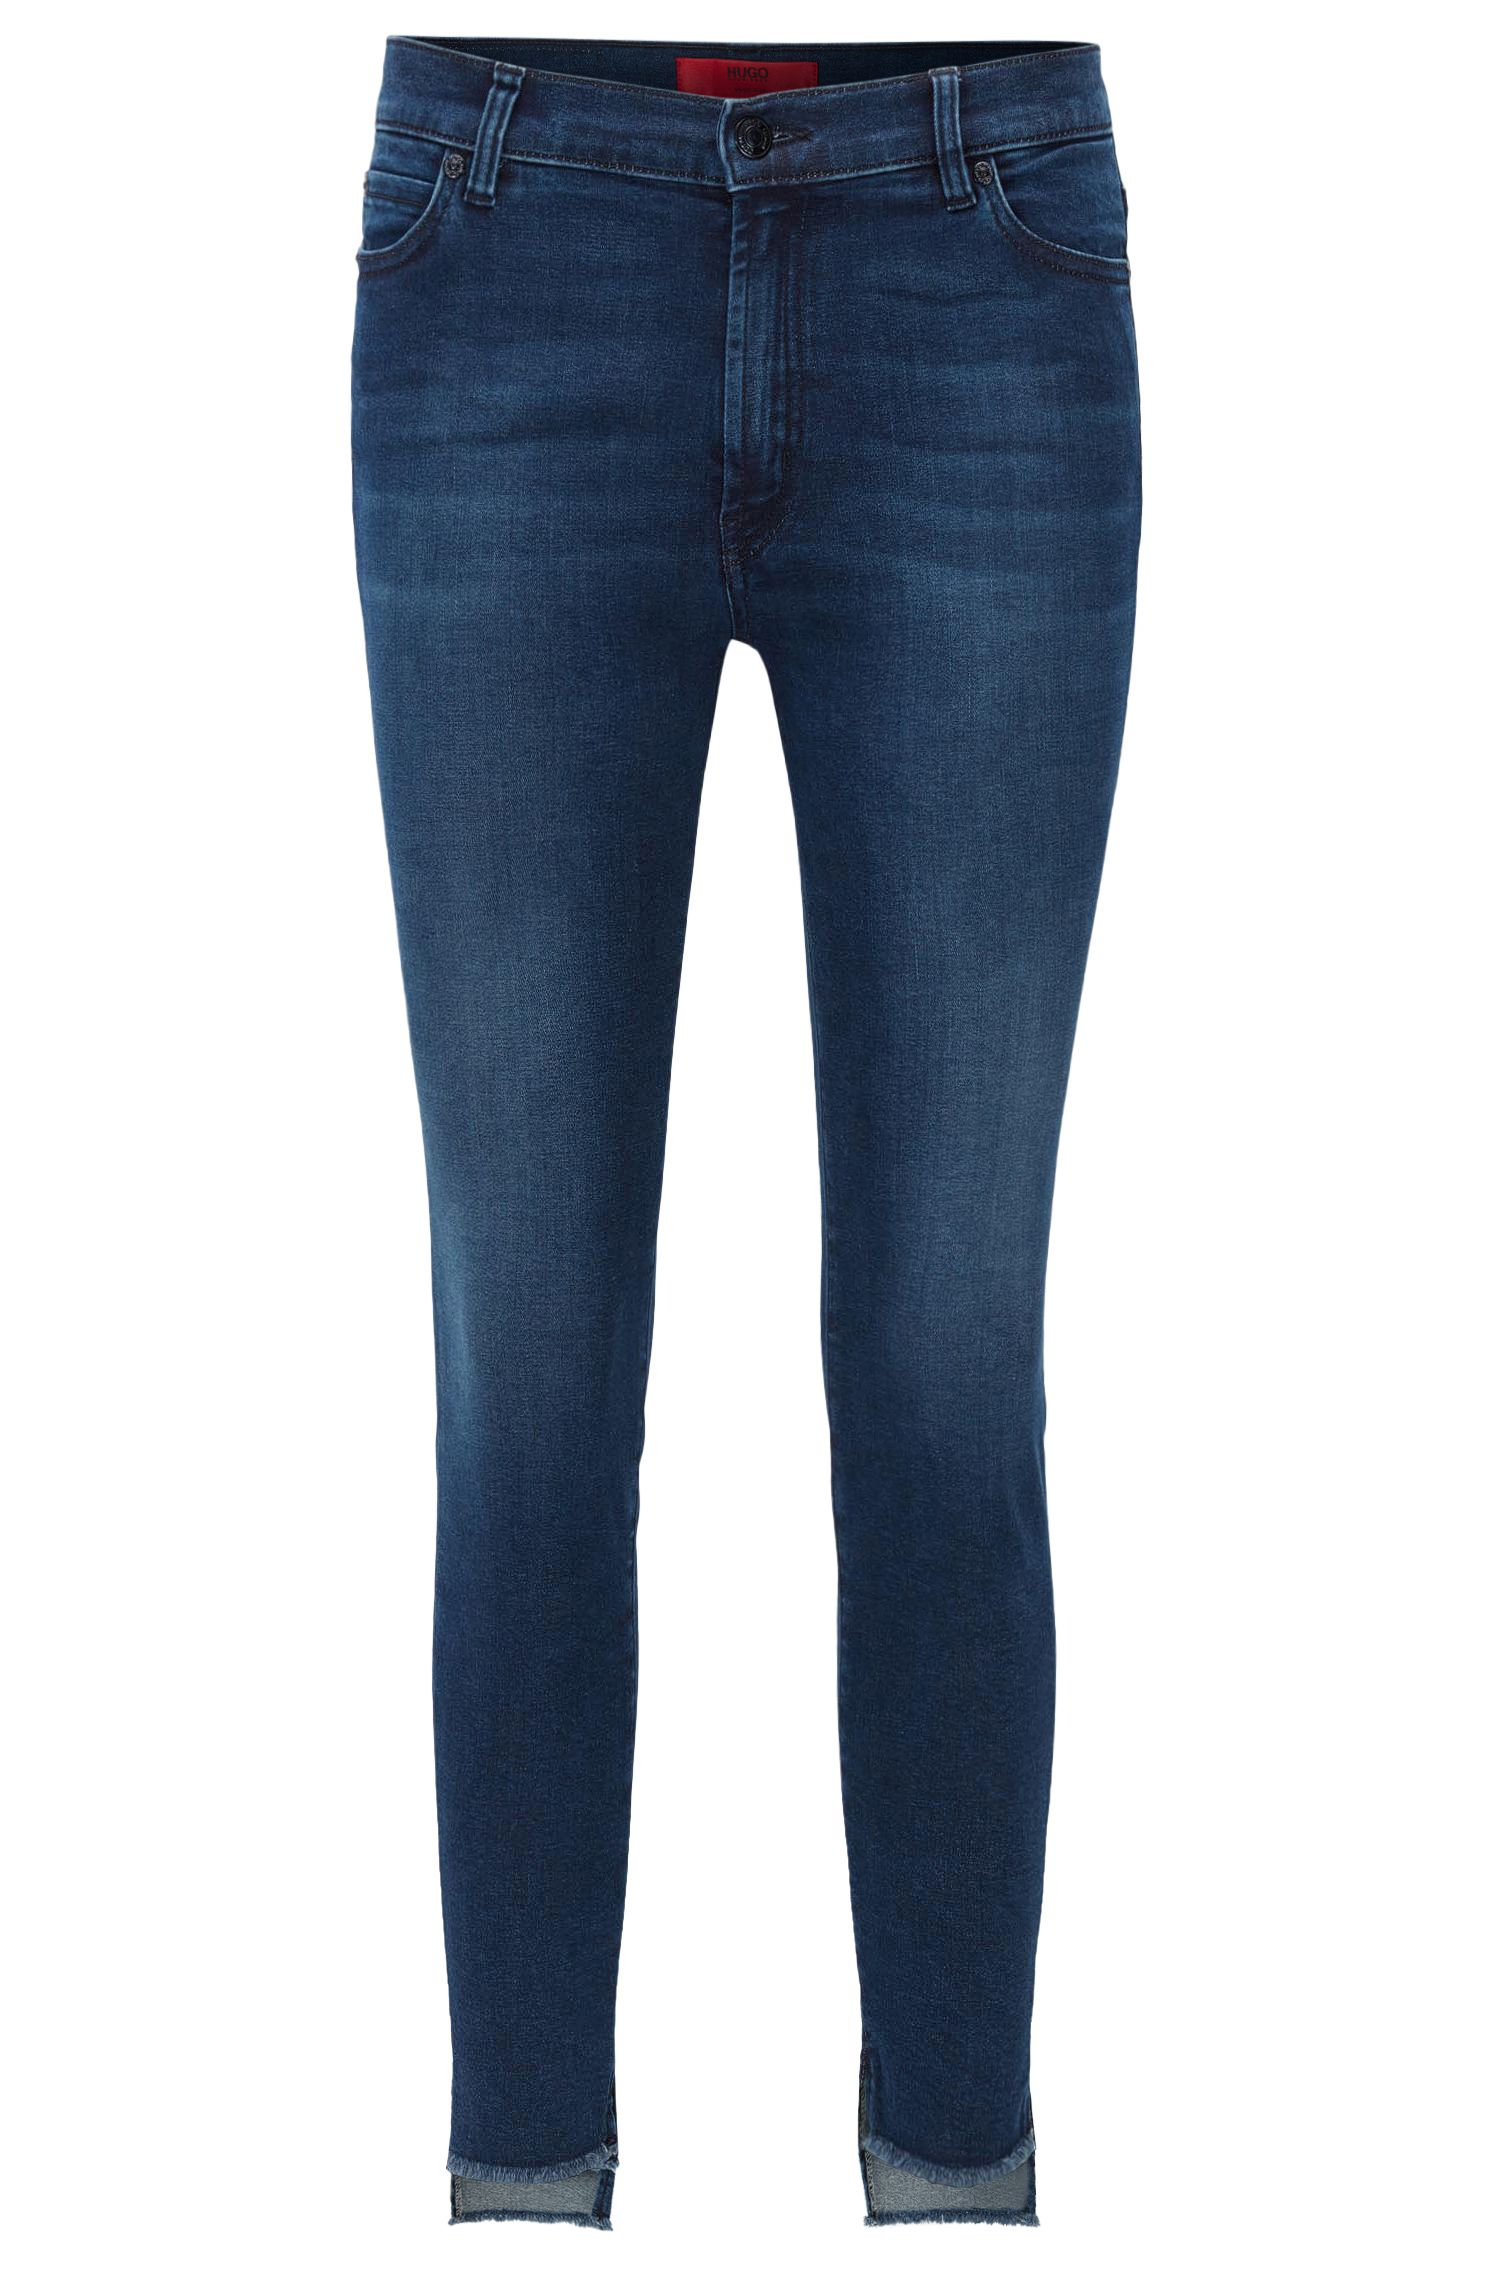 Extra-slim-fit super-stretch jeans with asymmetric hem